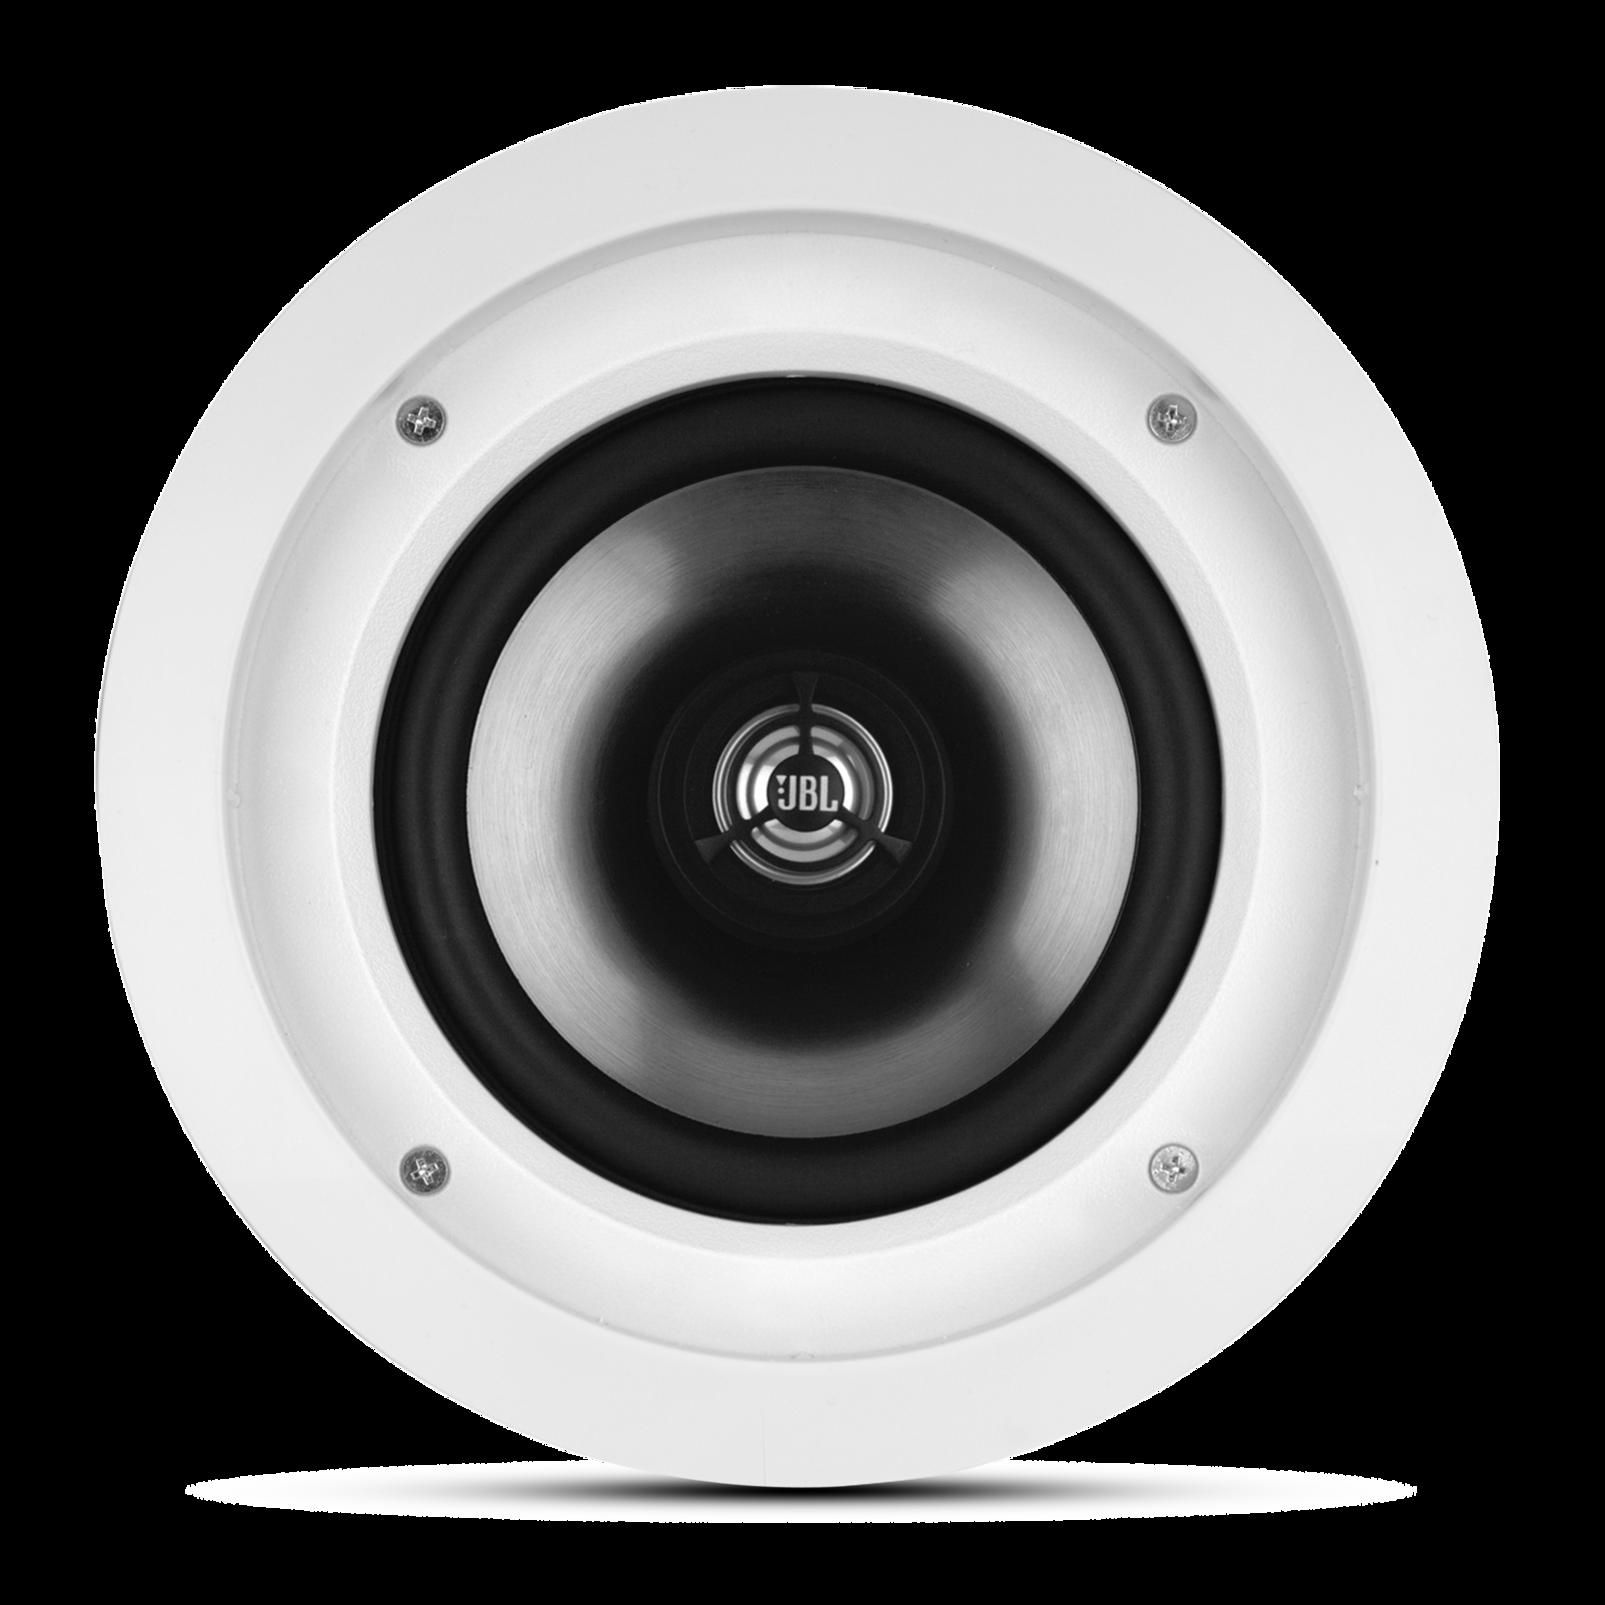 products ceiling jbl speakers us commercial medium en original hires